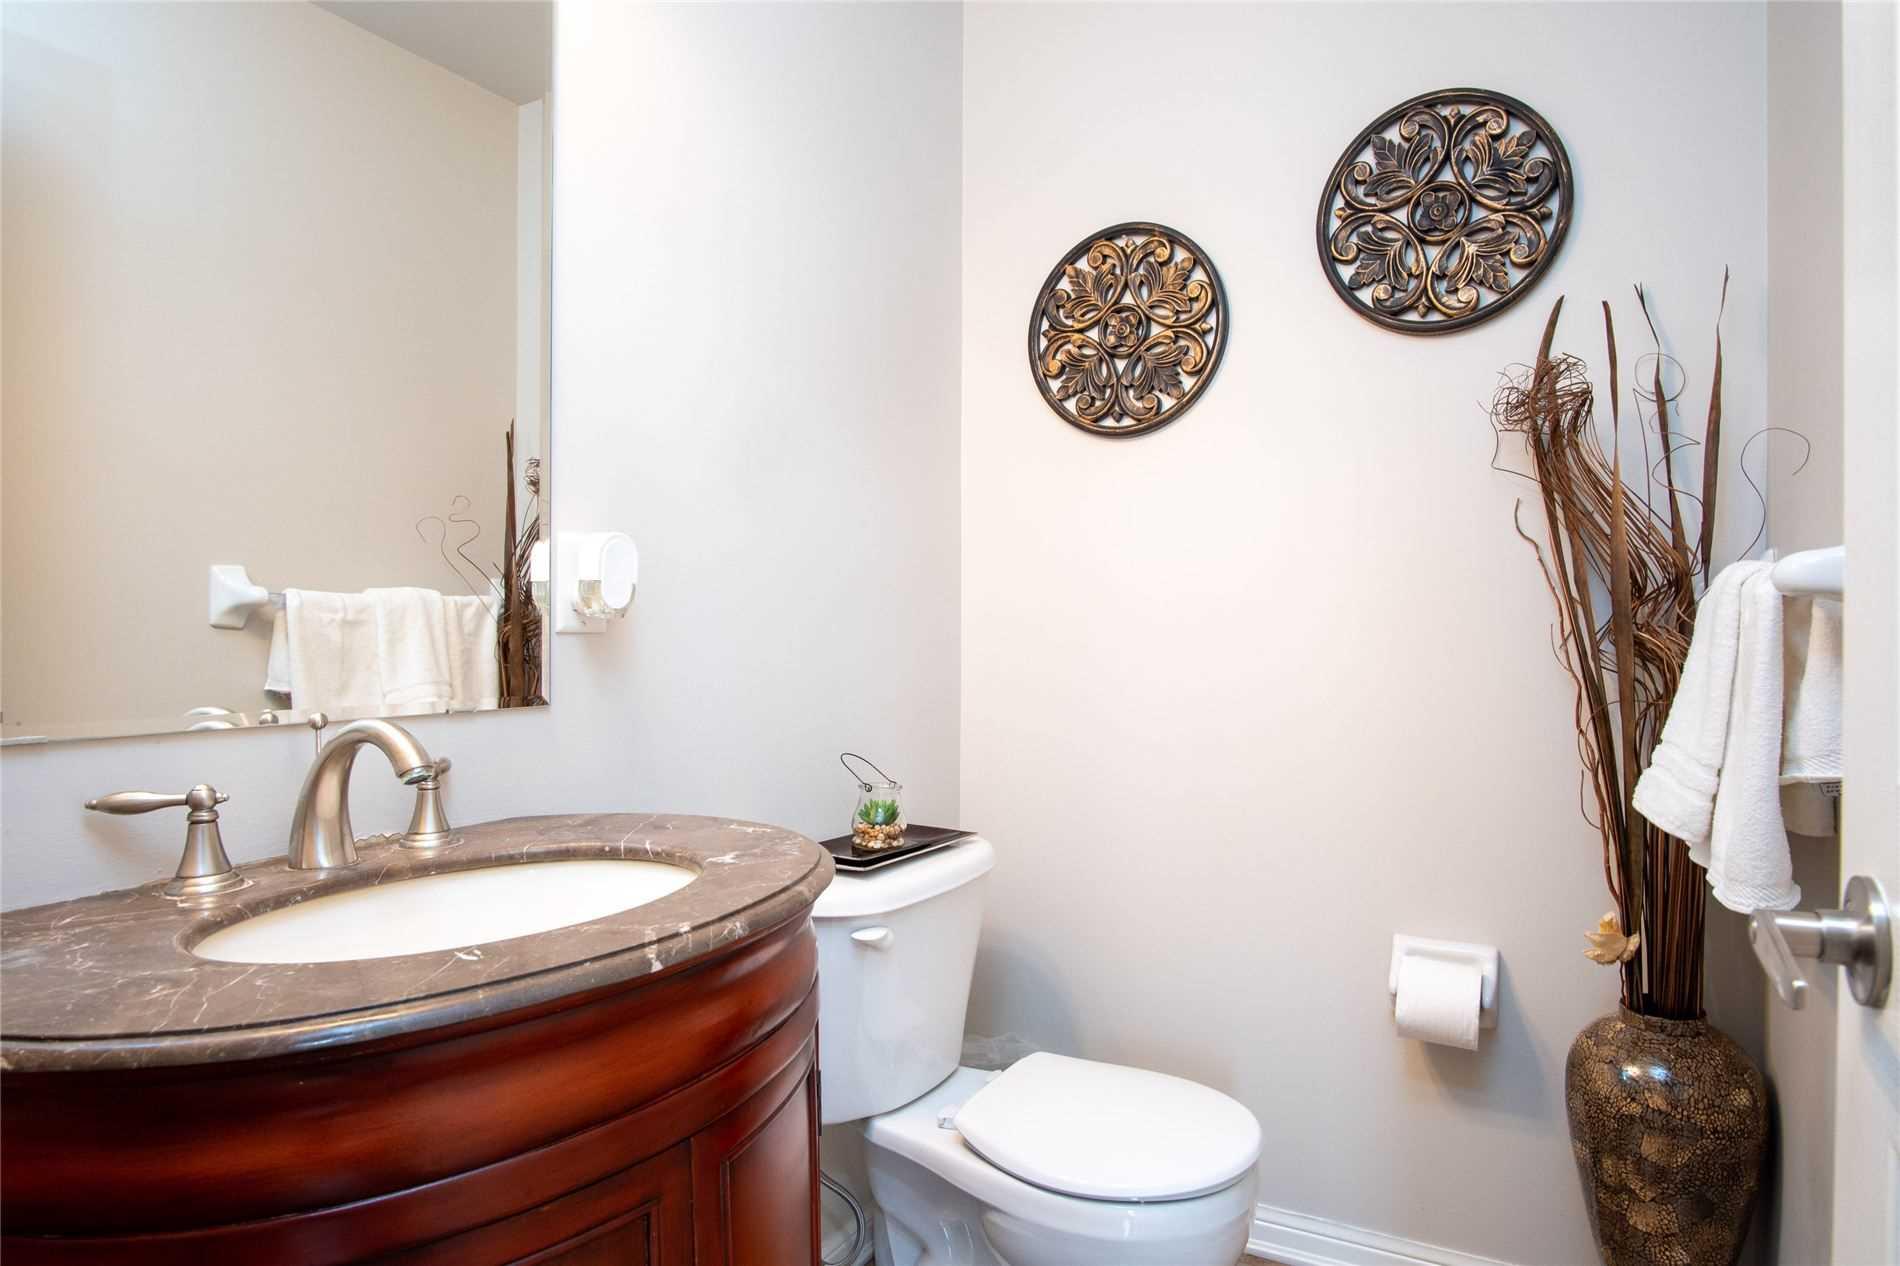 827 Biggar Hts - Coates Detached for sale, 4 Bedrooms (W5400280) - #6